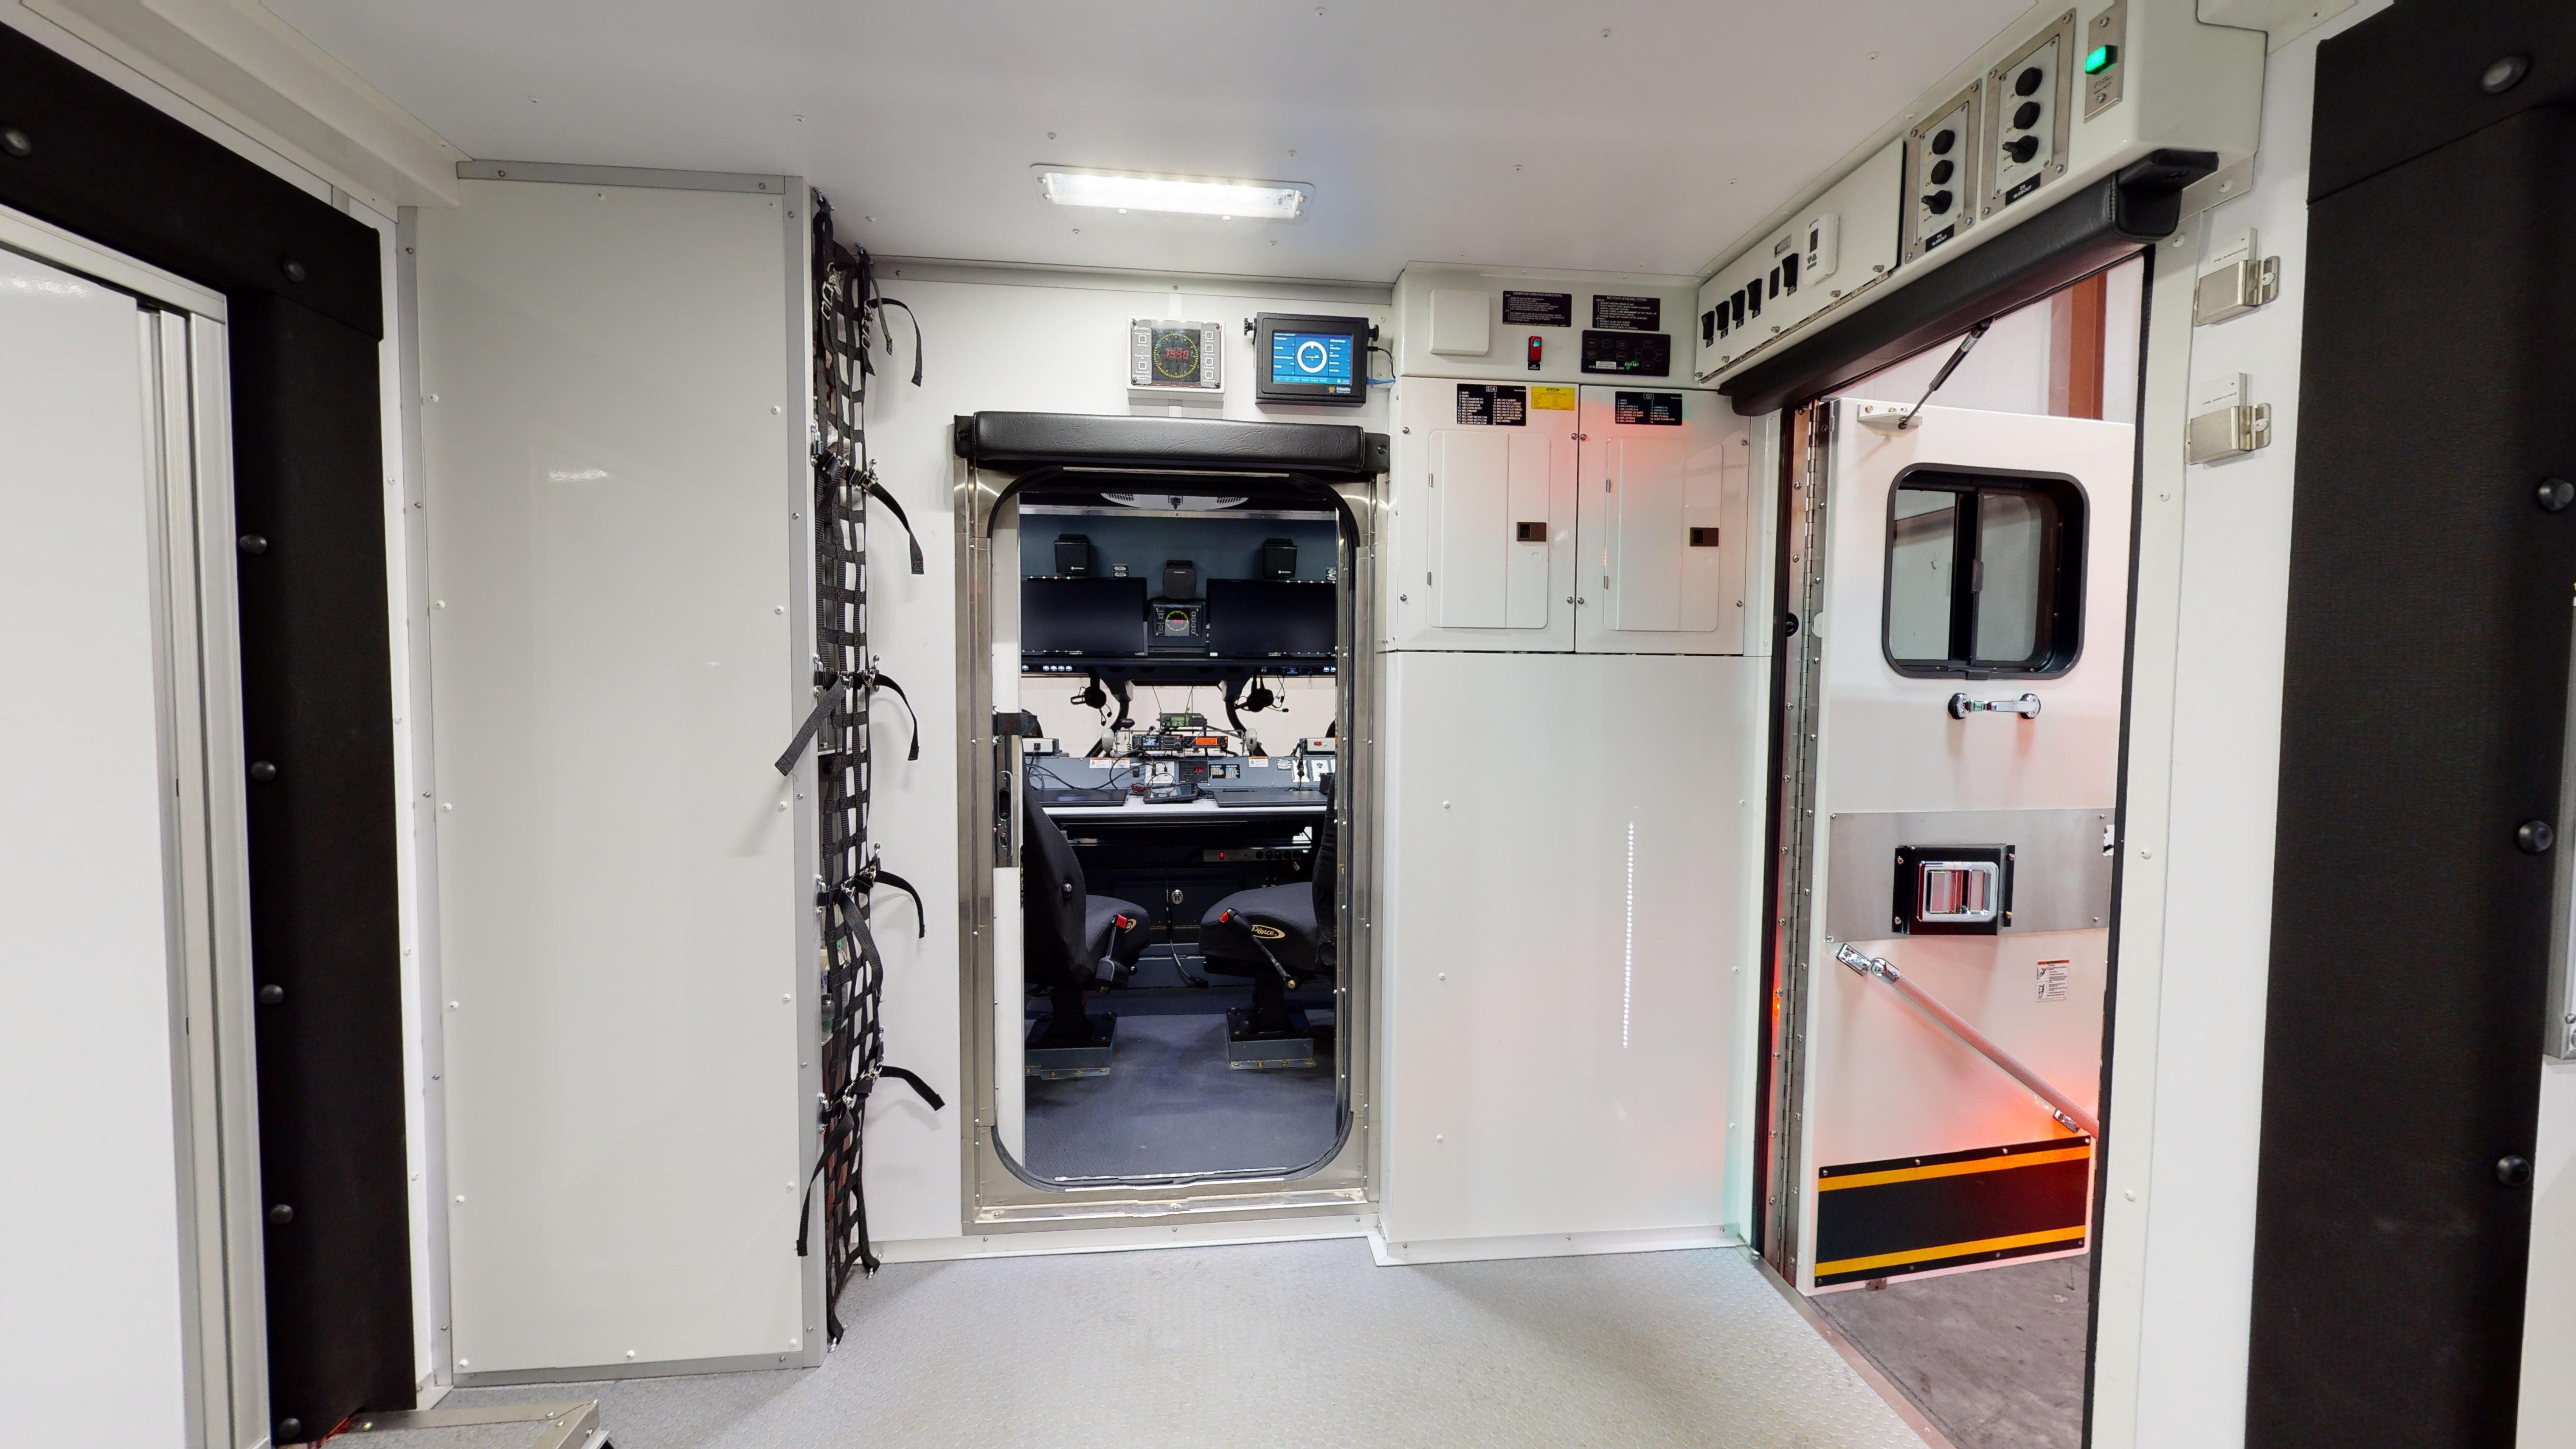 Pelham-Fire-Department-2019-Pierce-Velocity-HazmatCommand-Job-33168-06142021_135318